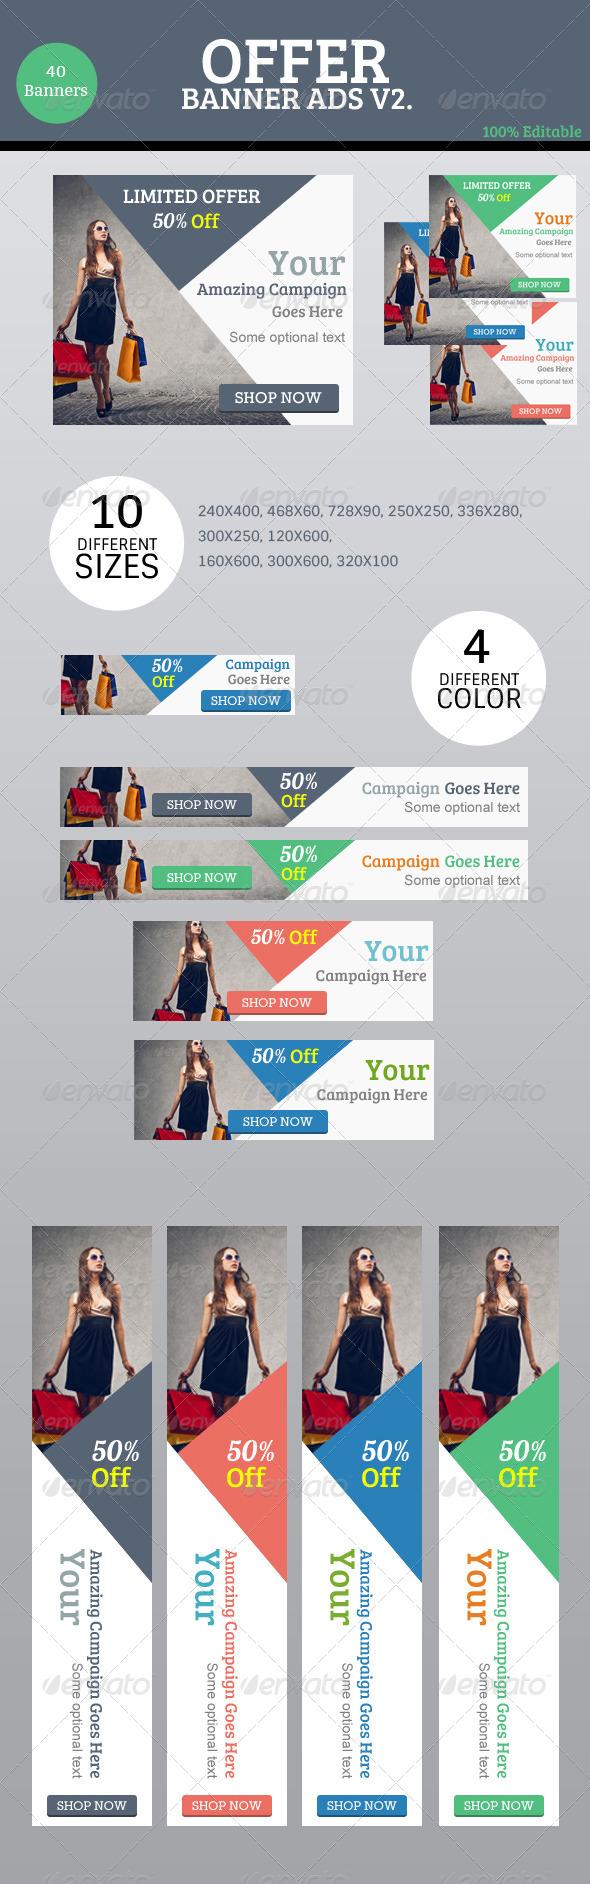 GraphicRiver Offer Banner Ads V2 8683096